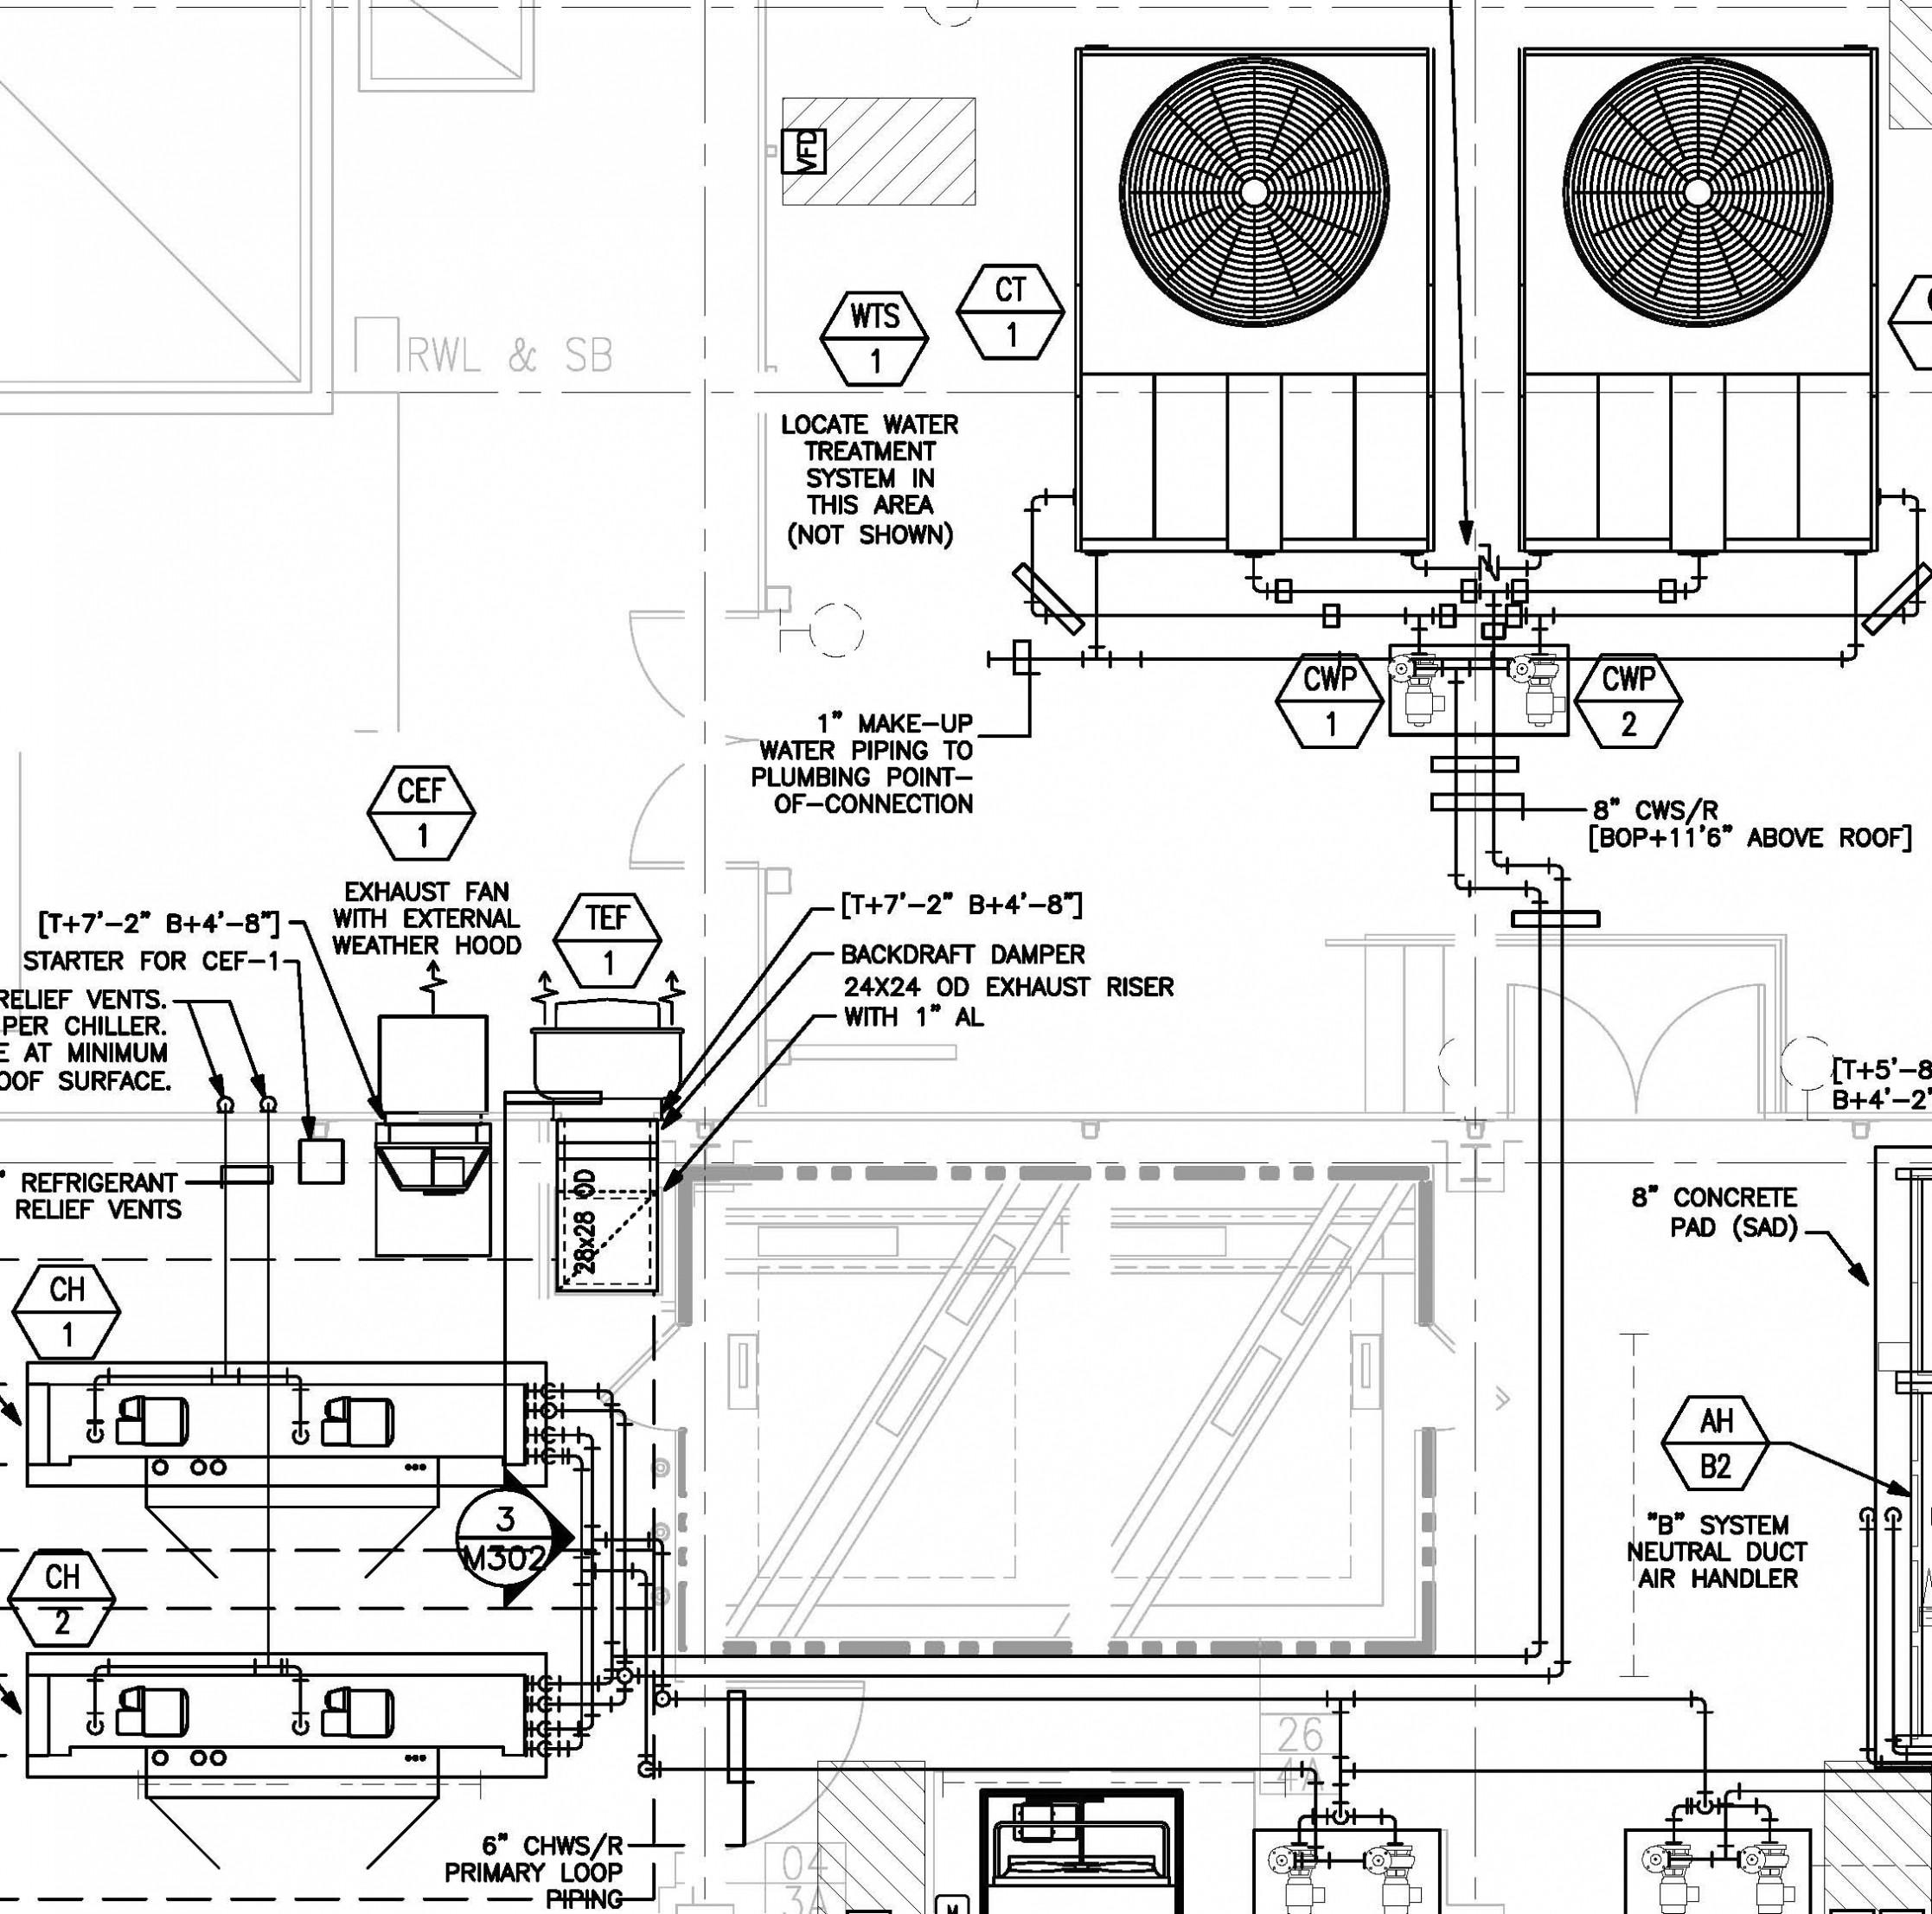 12 Volt Alternator Wiring Diagram New Wiring Diagram 12 Volt Starter Generator Refrence Automotive Electrical